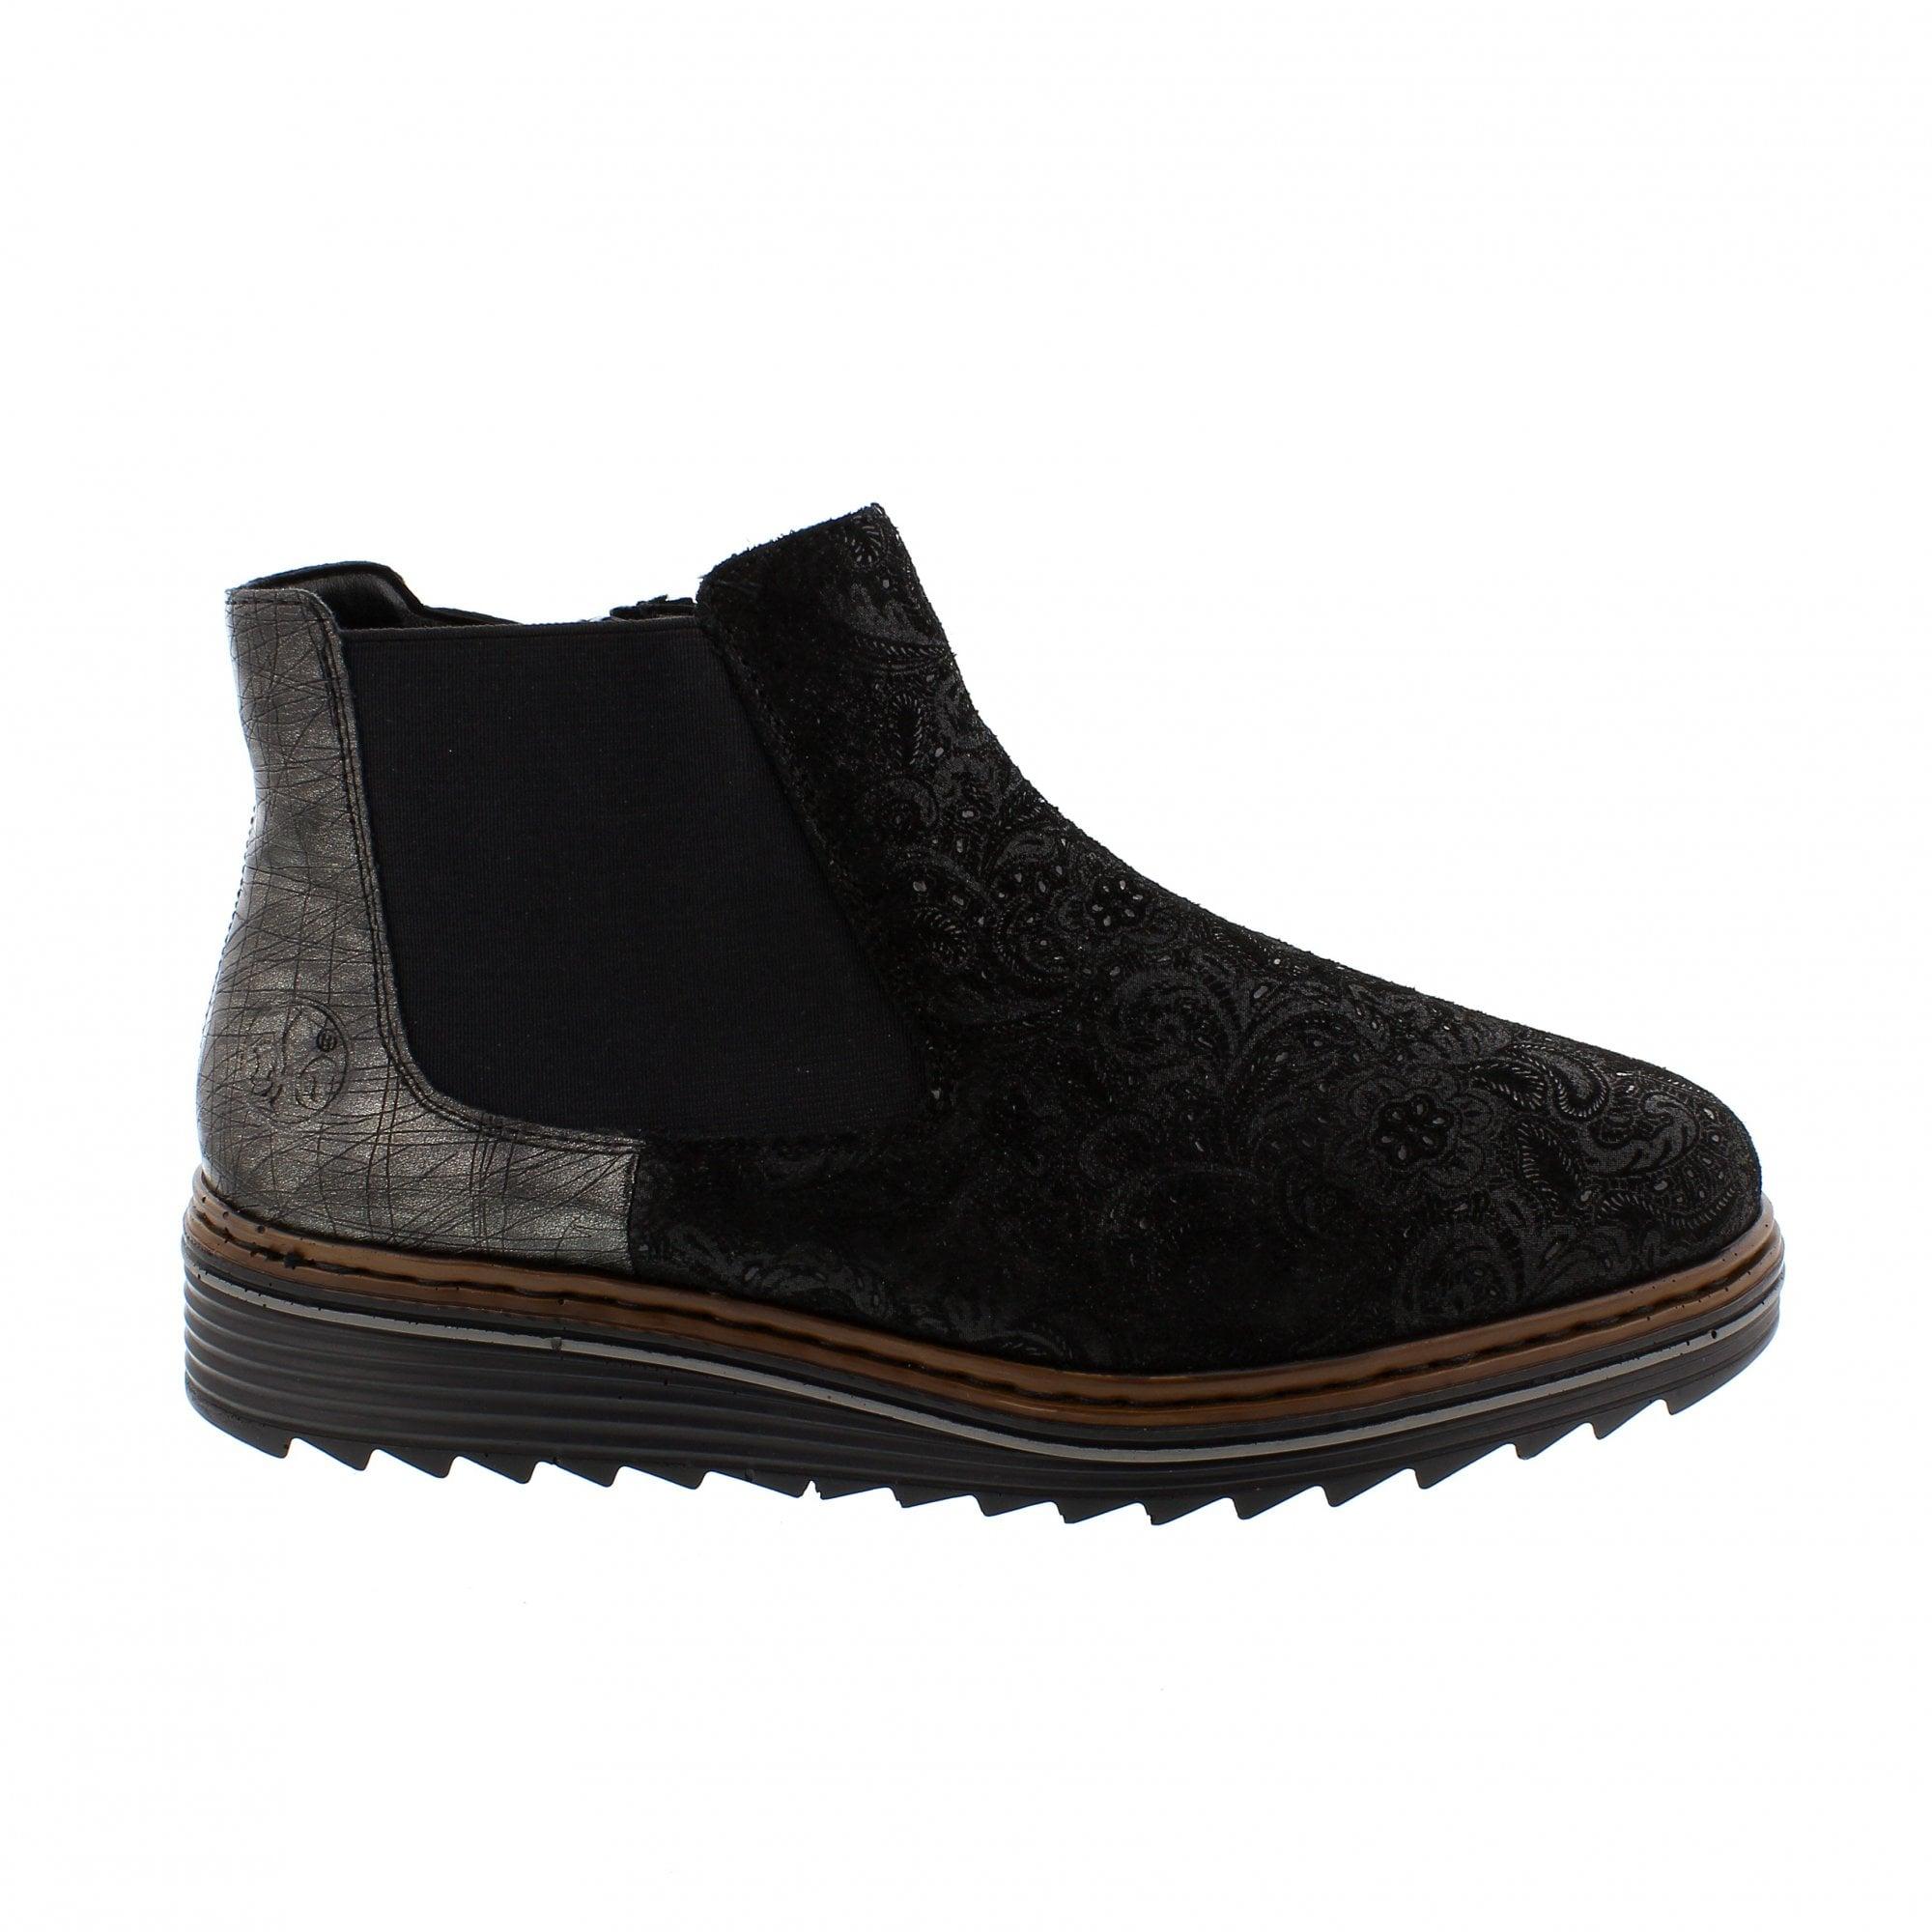 450ff216b6bcf1 Rieker Y6384-02 Black Pewter Womens Chelsea Boots